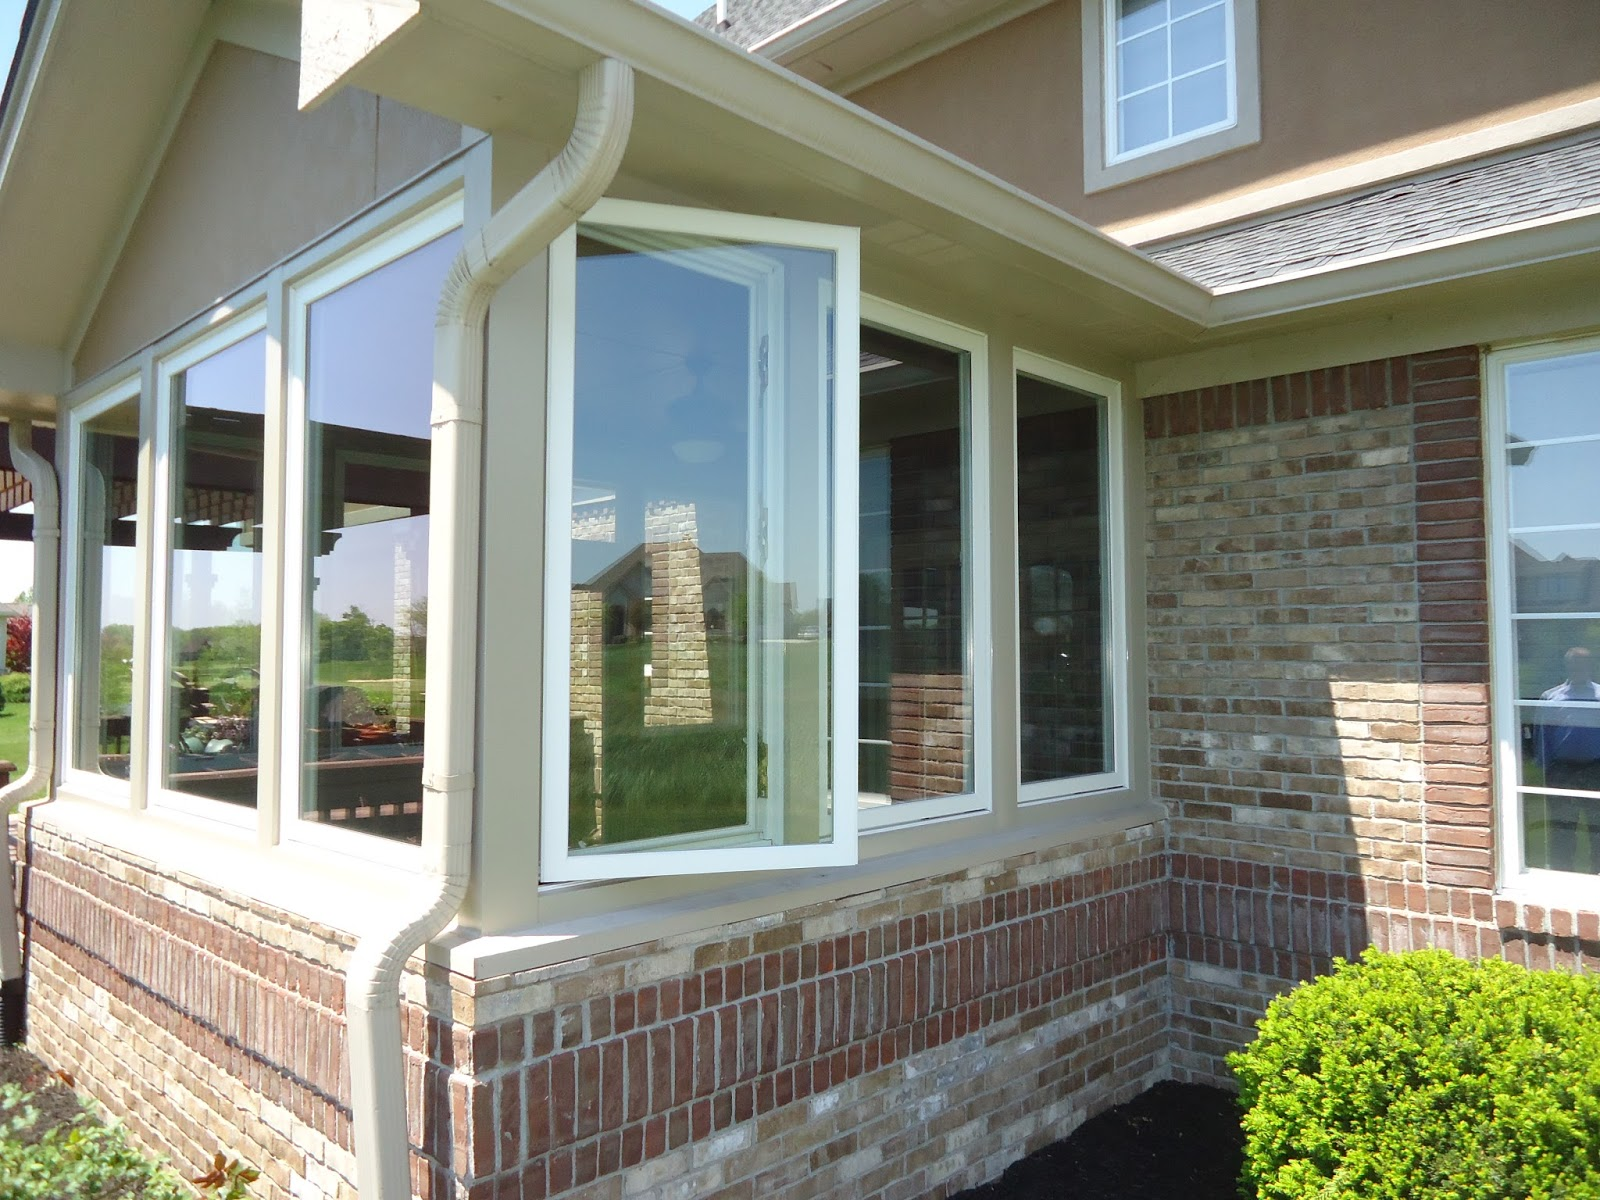 Dallas beewindow porch conversion casement windows for Patio windows